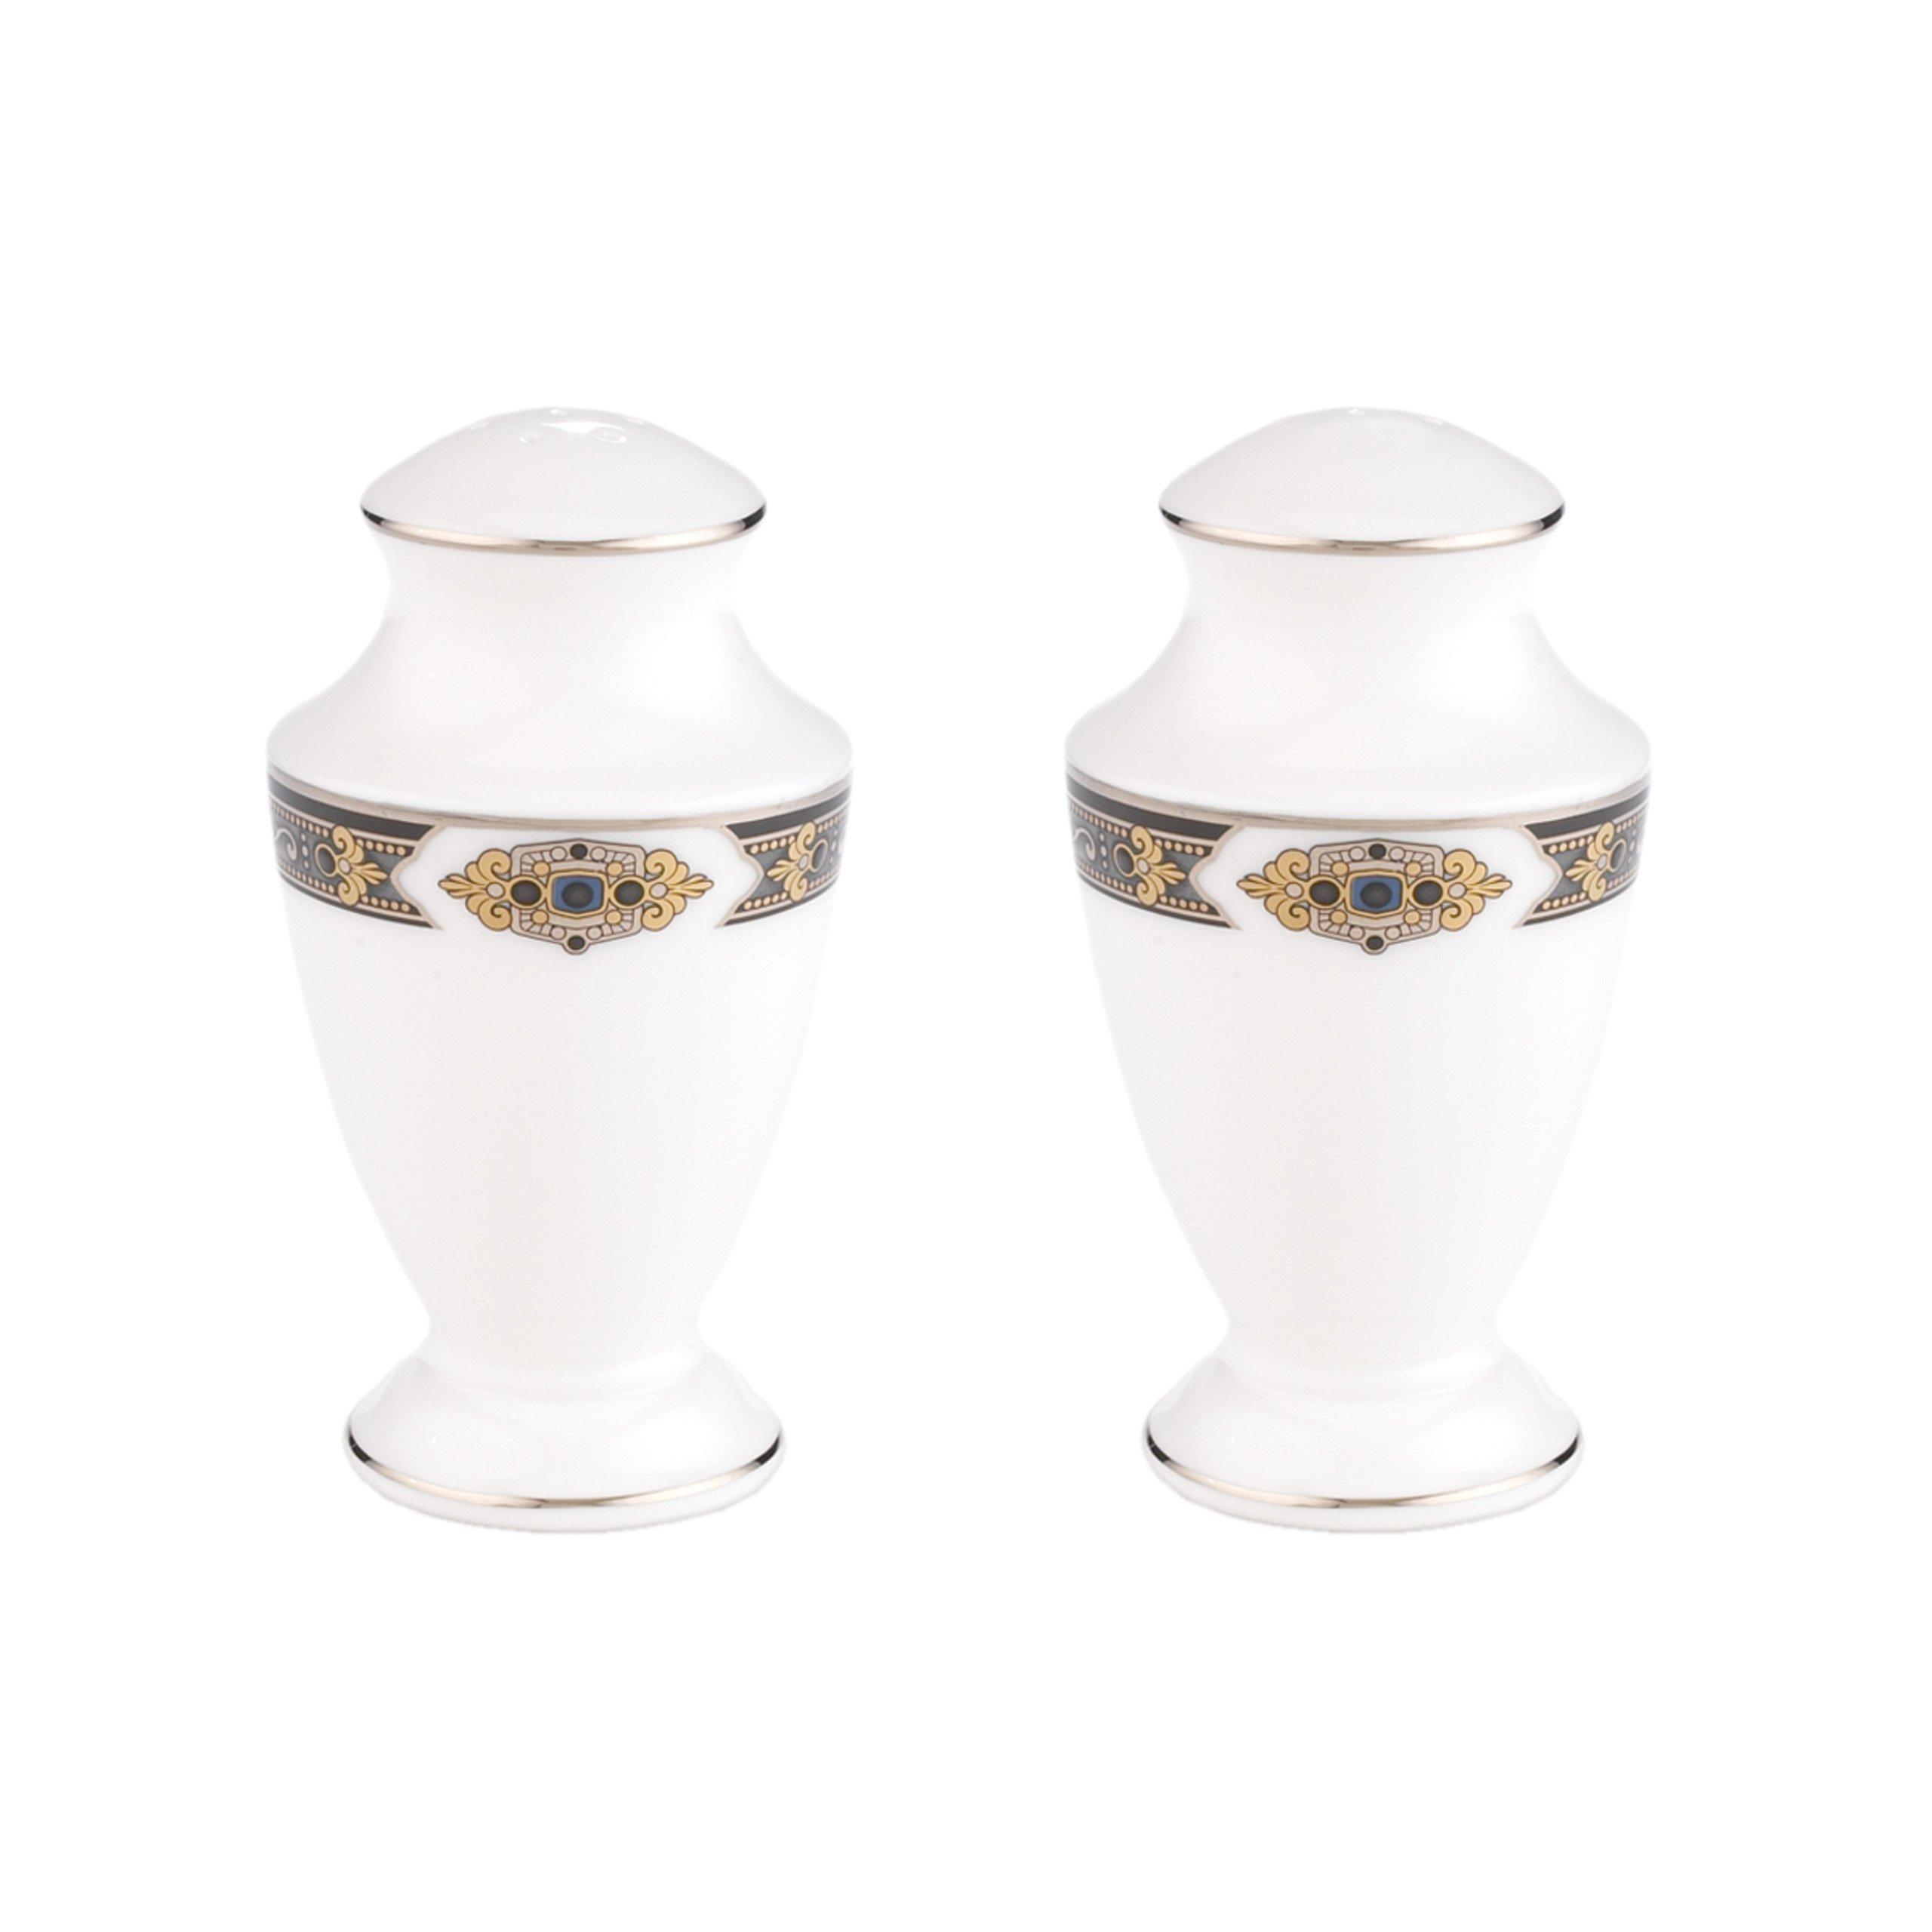 Lenox Vintage Jewel Salt and Pepper Set, White by Lenox